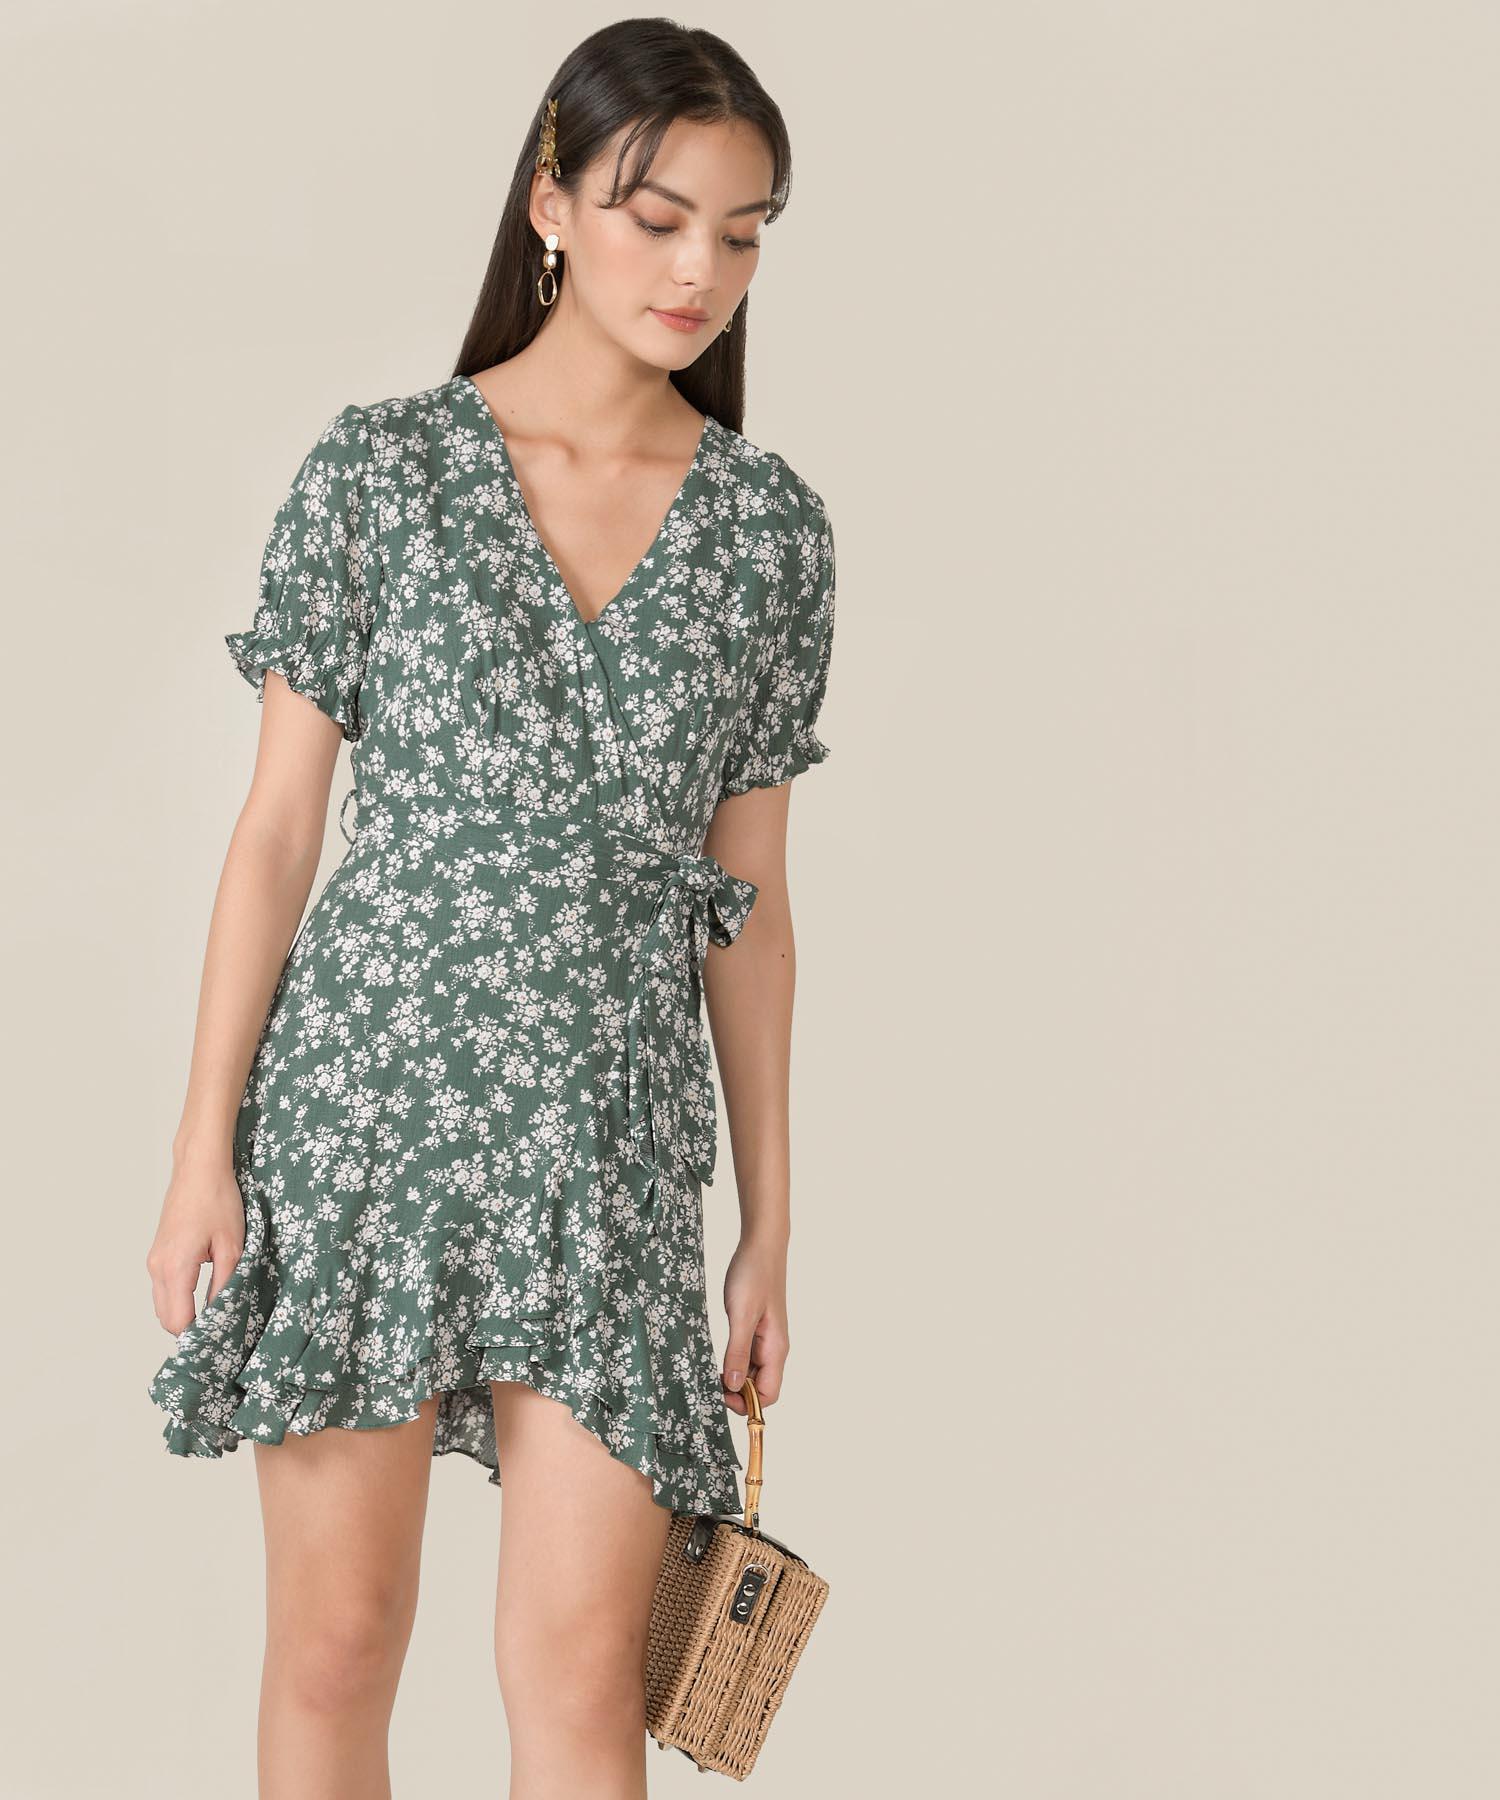 rue-floral-ruffle-overlay-dress-eucalyptus-1